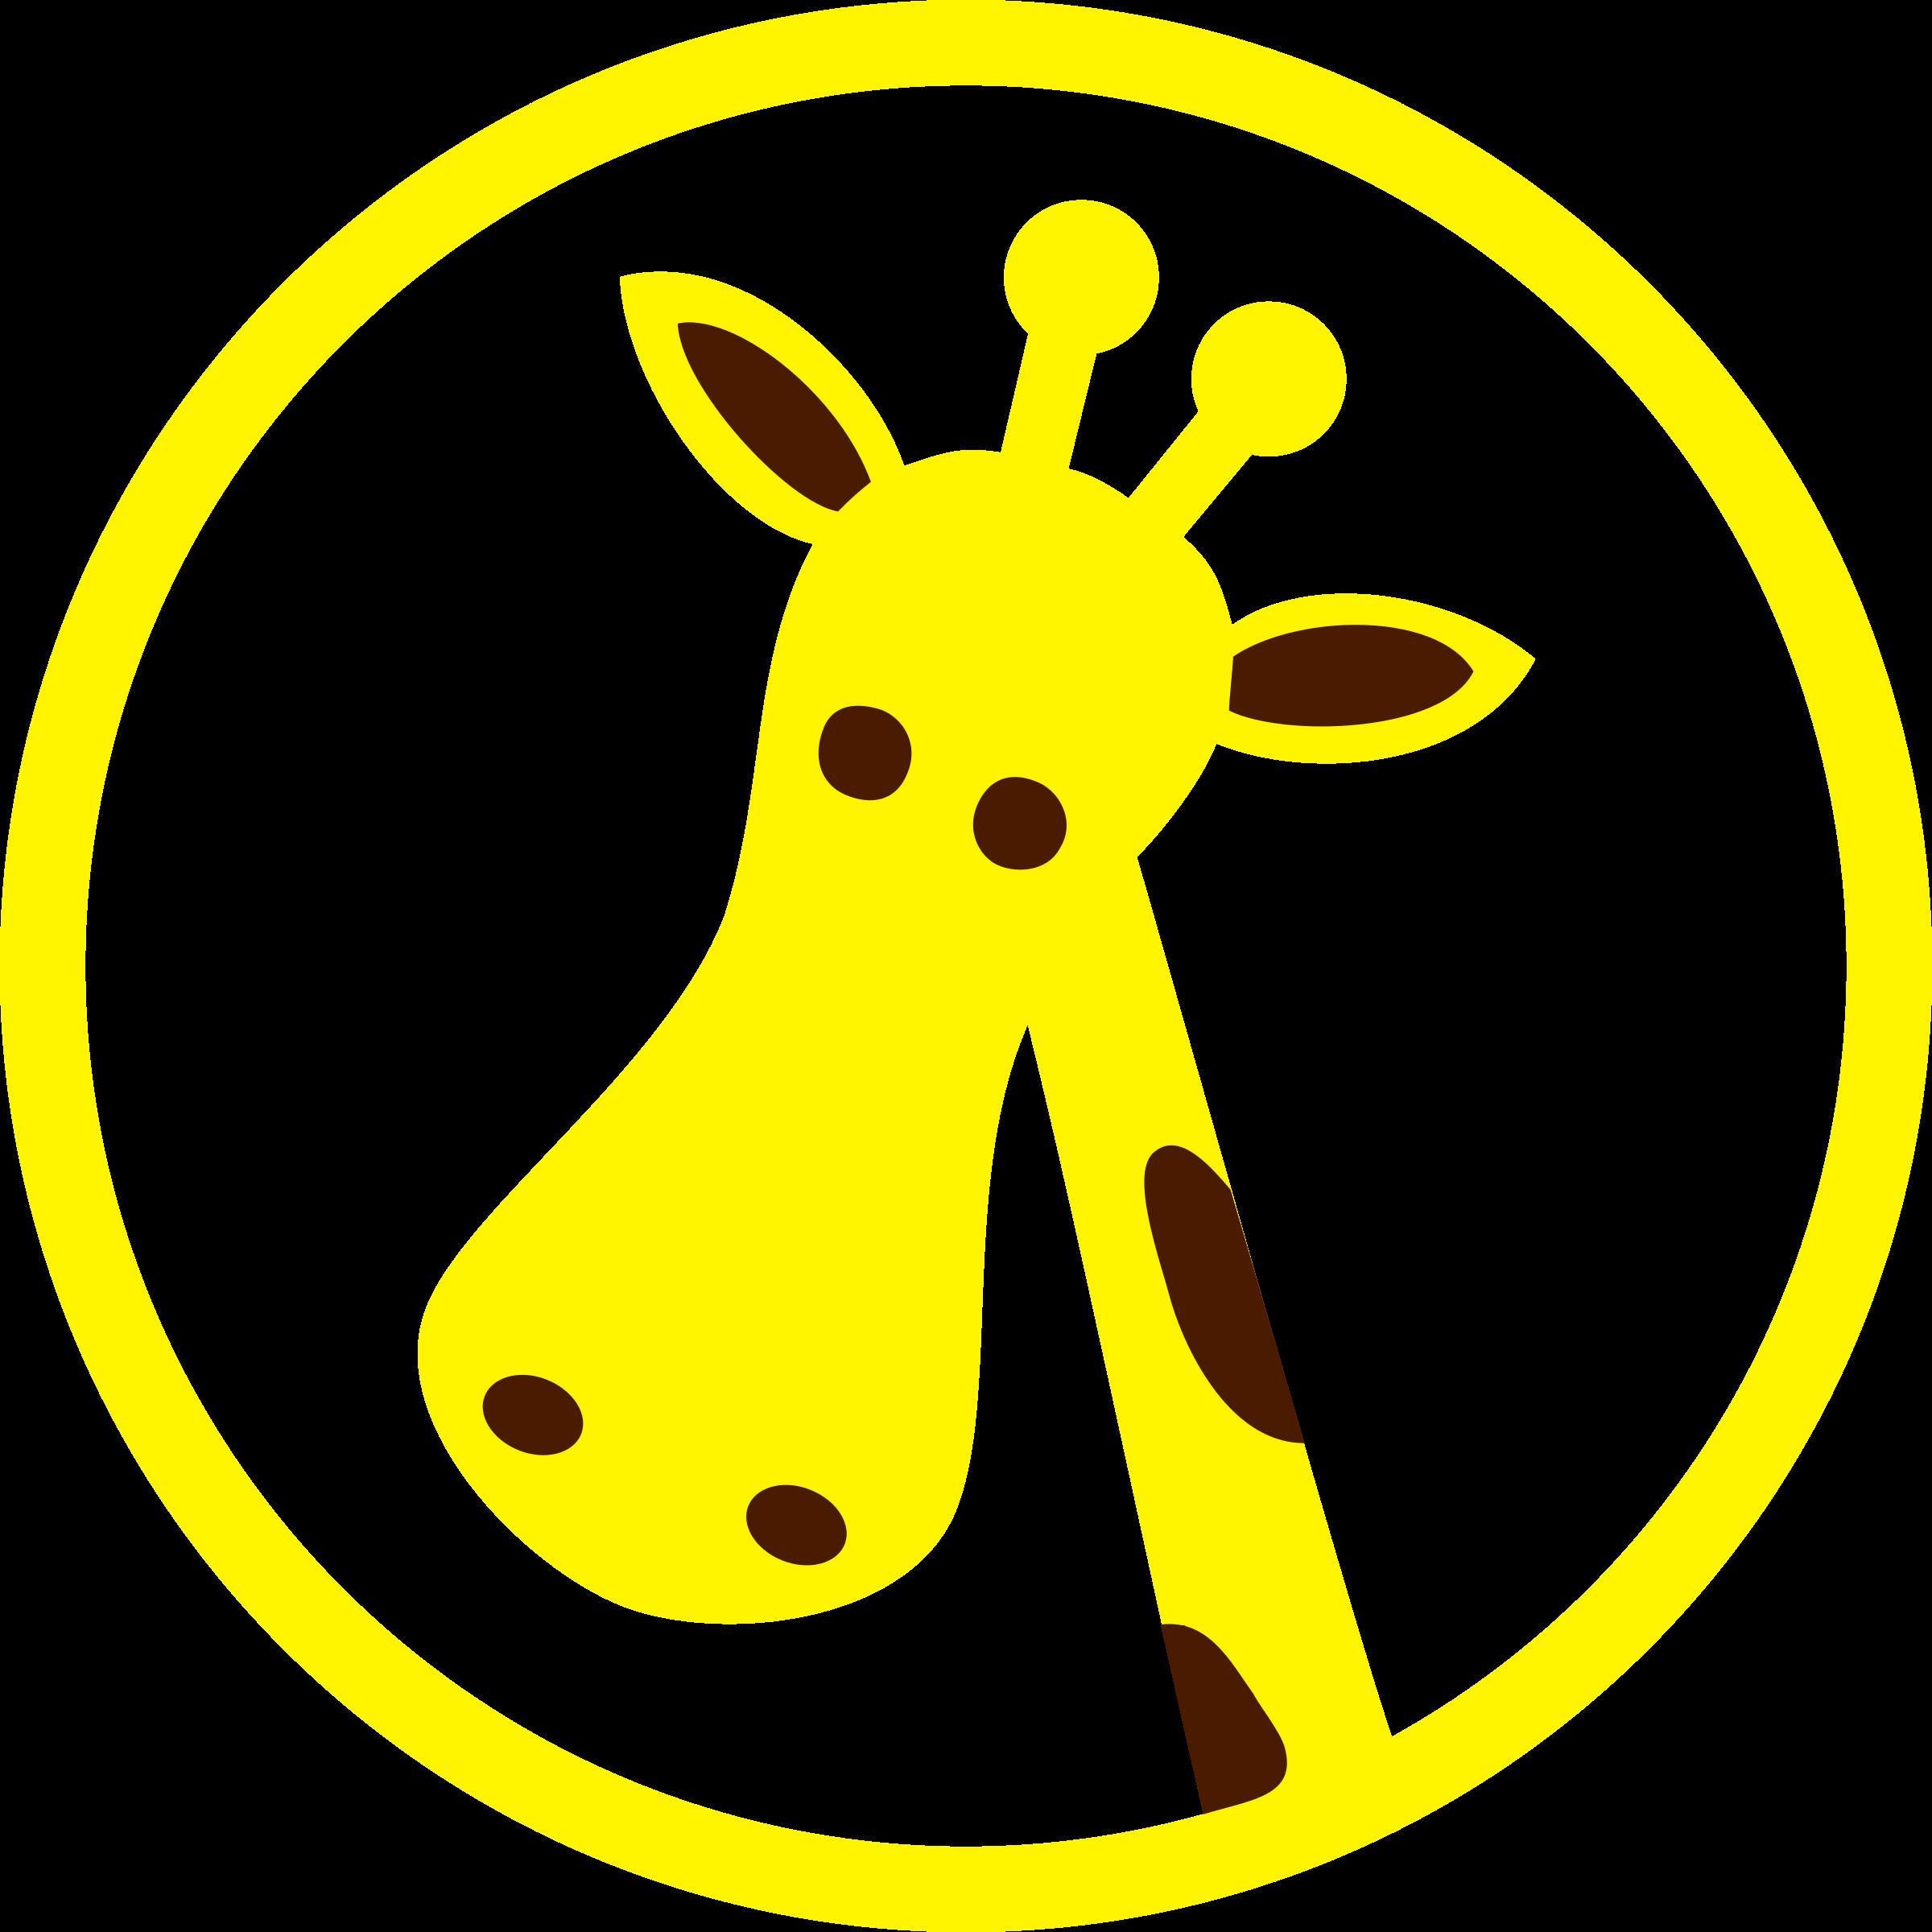 Giraffe clipart head. Big image png